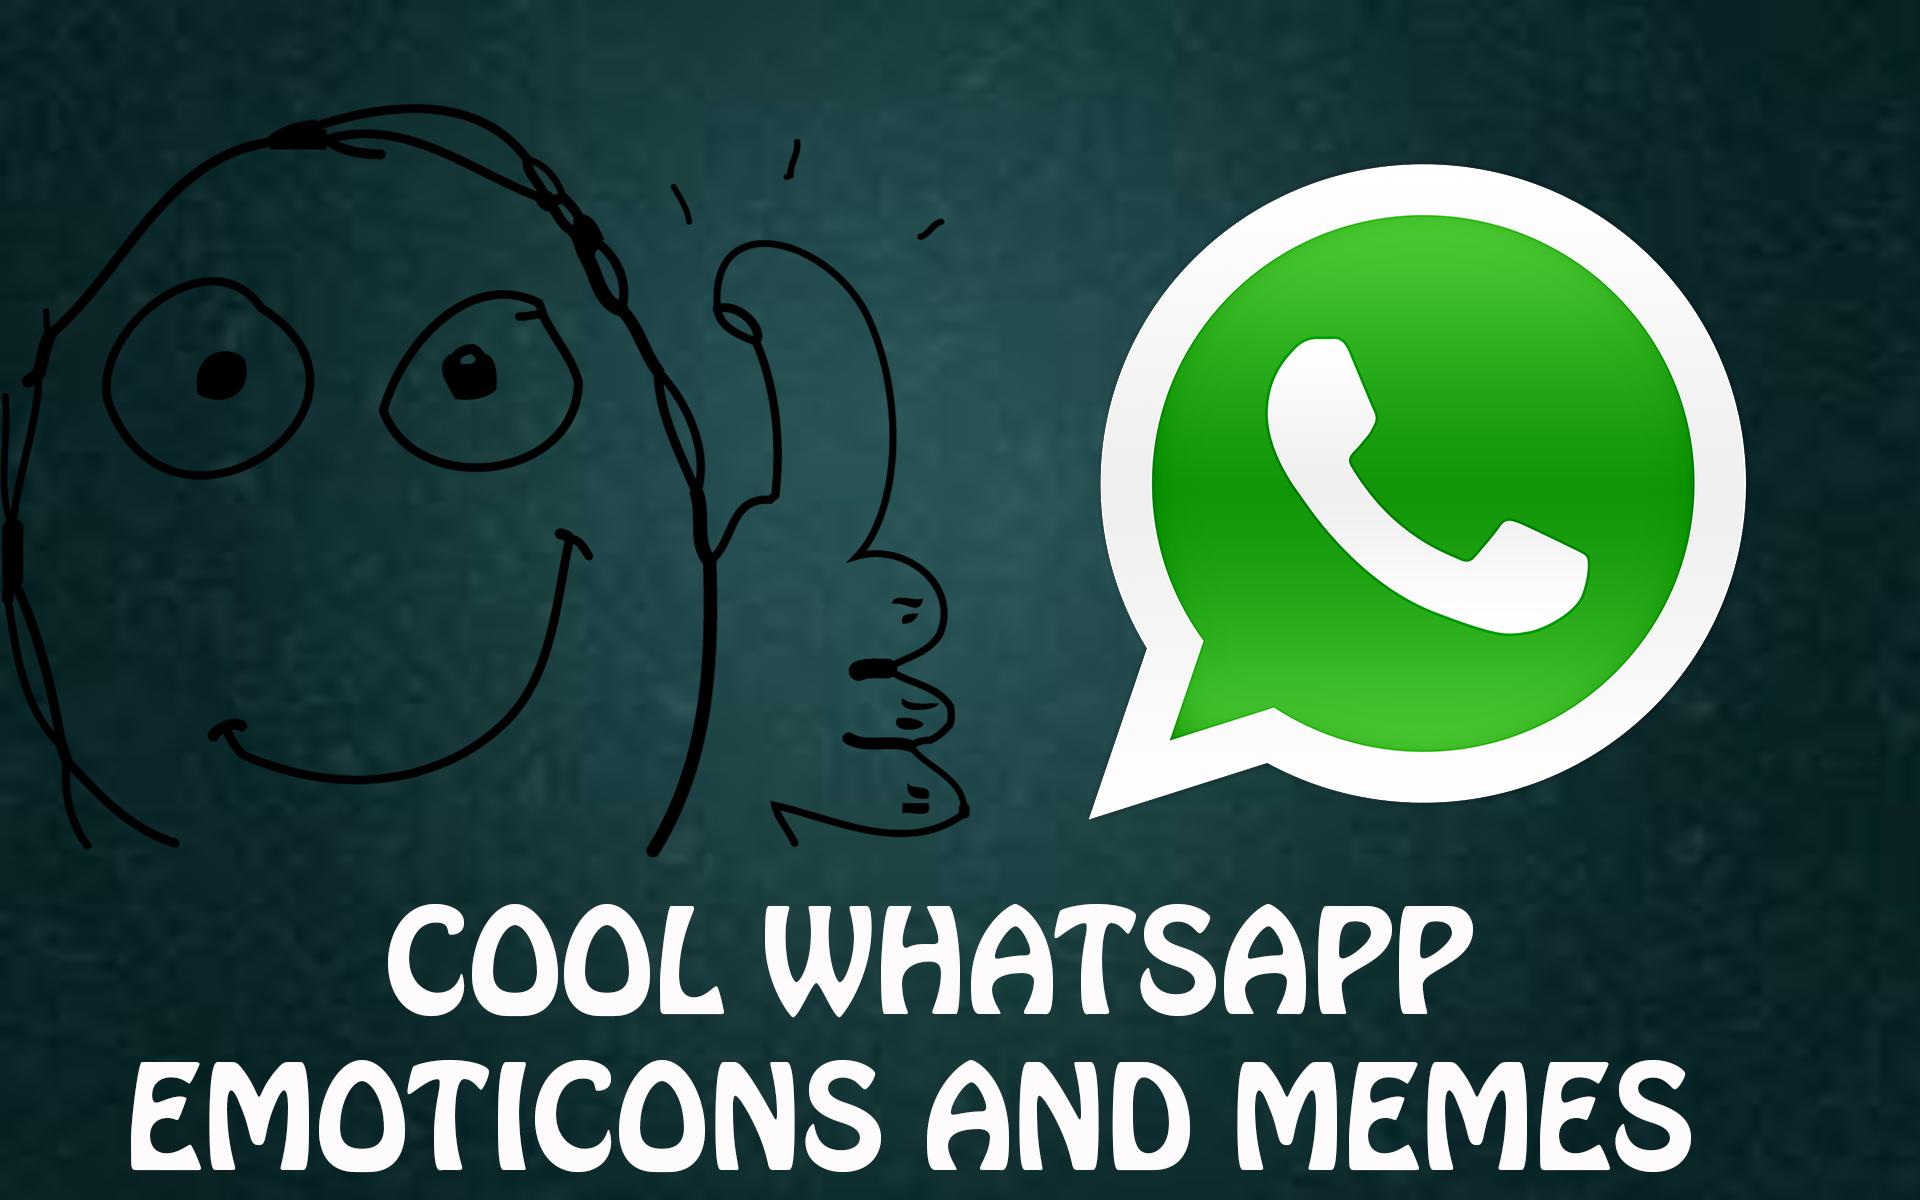 Whatsapp tricks impress your friends with whatsapp emoticons biocorpaavc